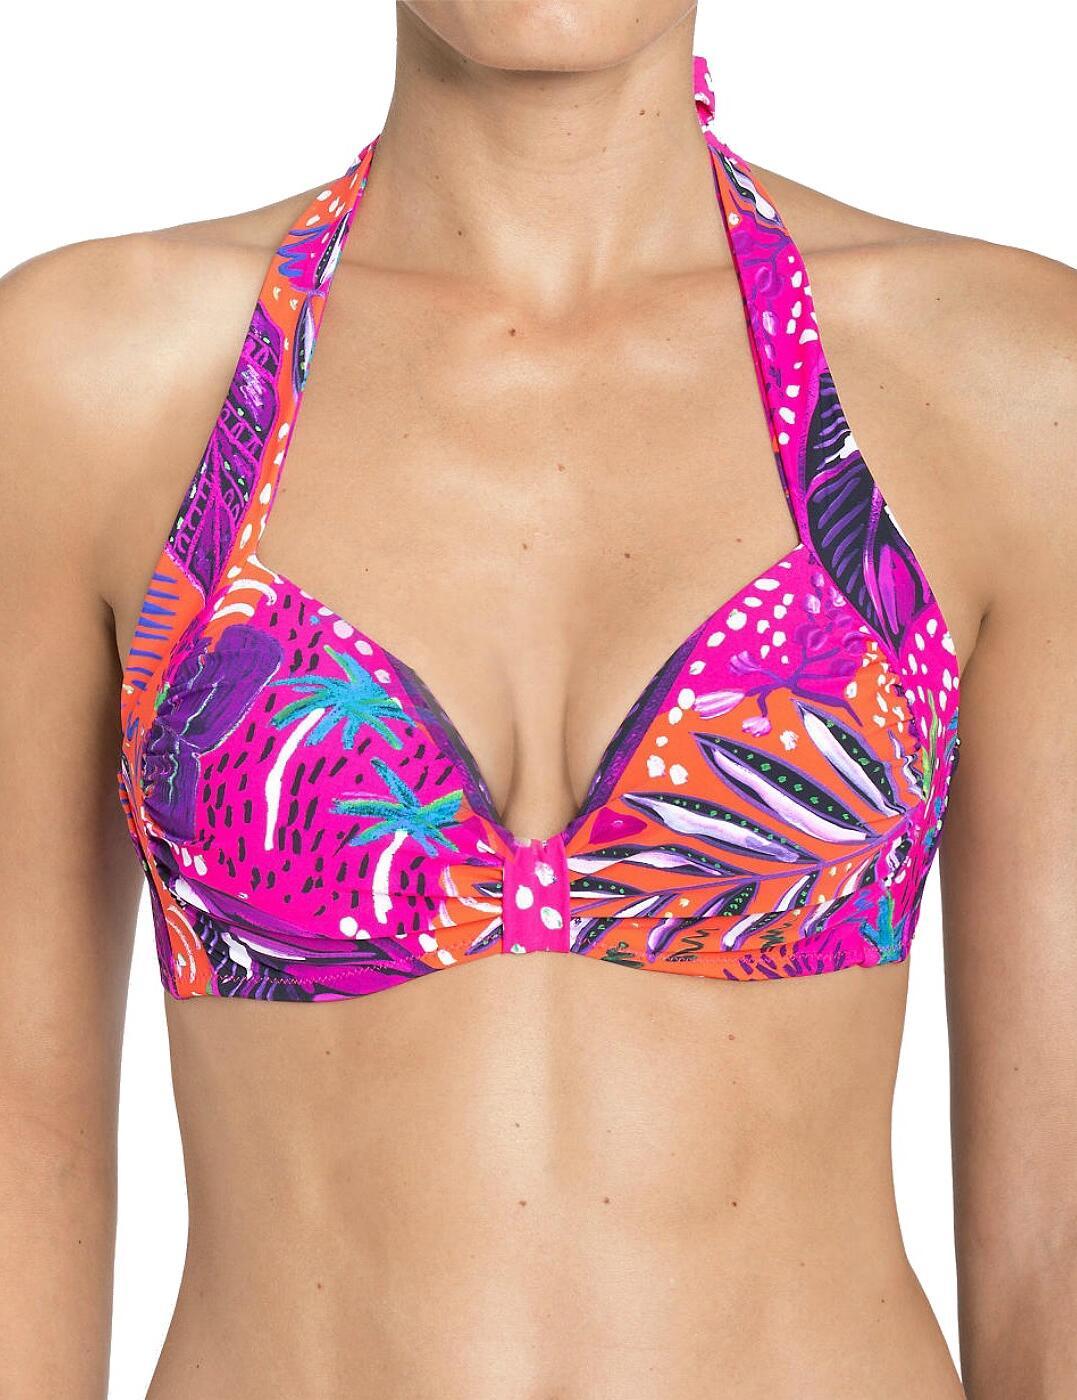 Triumph Painted Tulum (MWP) Magic Wire Padded Bikini Top - Belle ... 0244d355e0